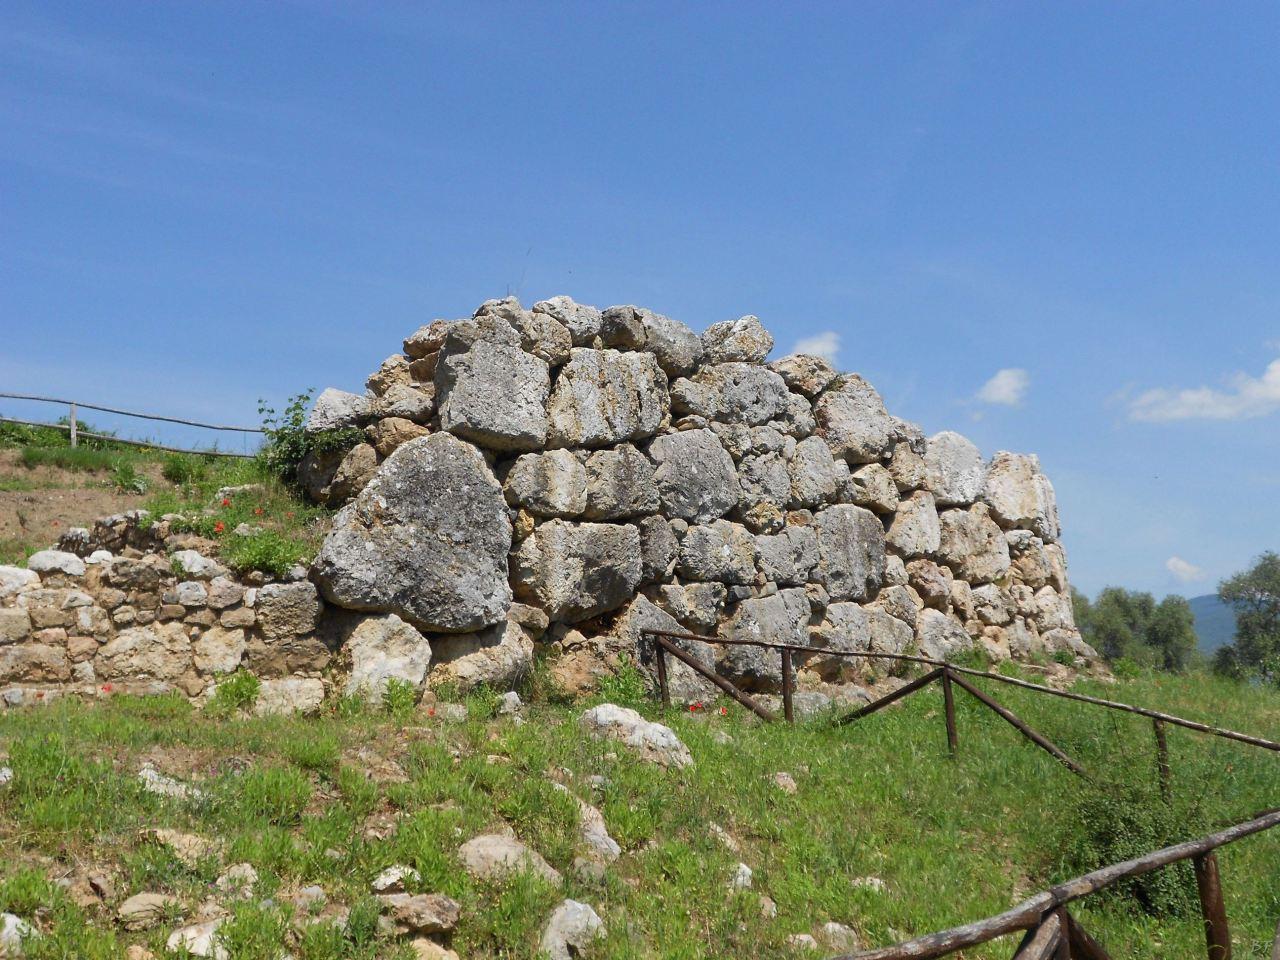 Roselle-Mura-Megalitiche-Roselle-Grosseto-Toscana-Italia-38